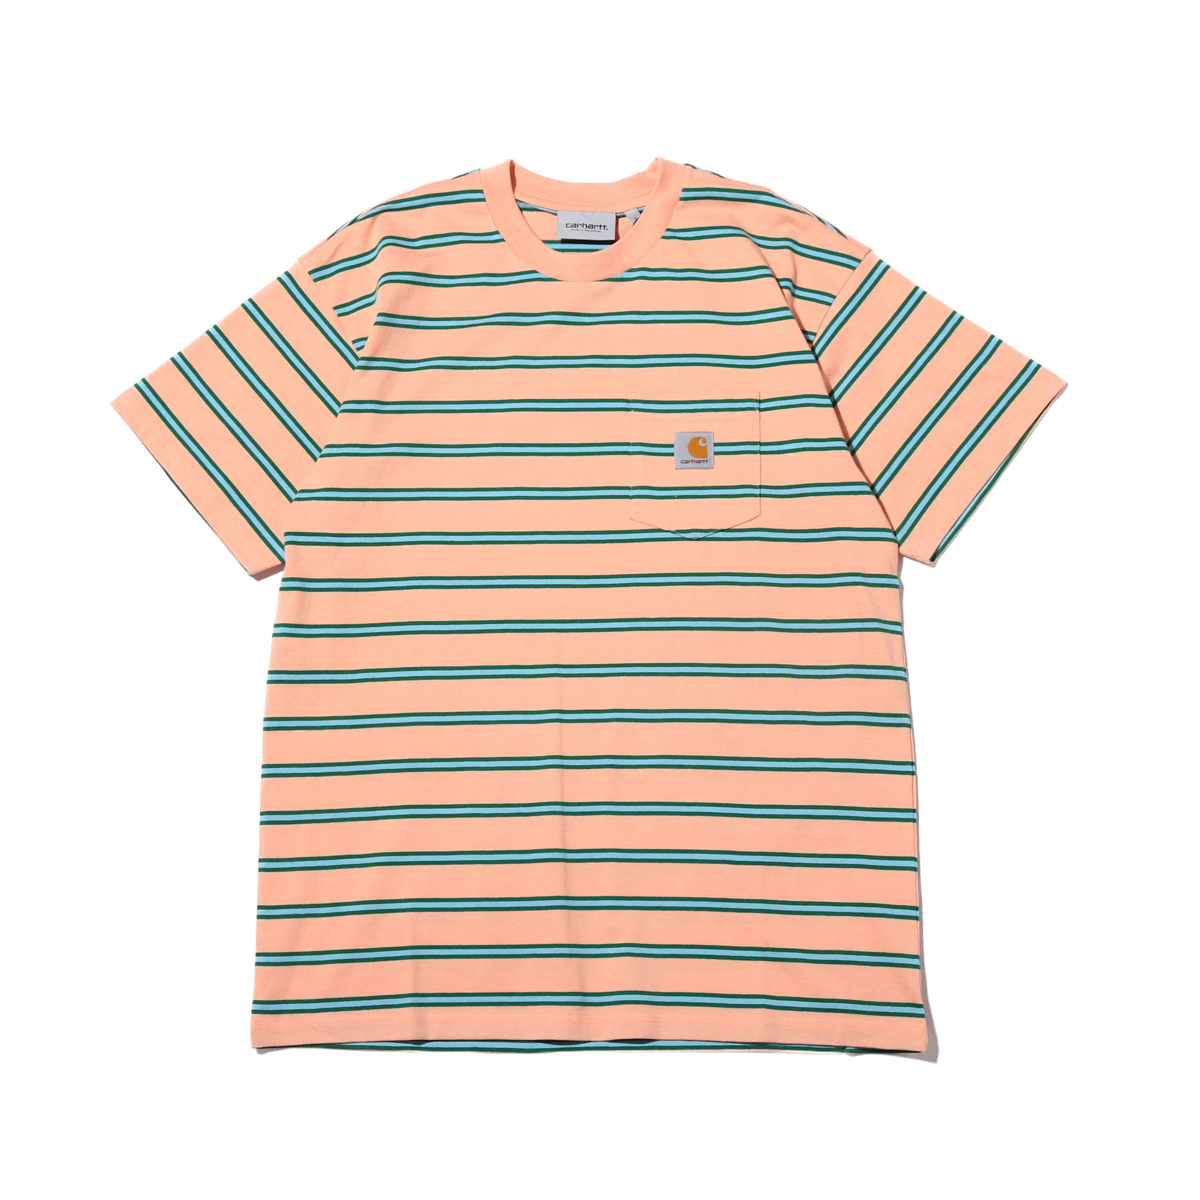 CARHARTT S/S HOUSTON POCKET T-SHIRT (カーハート ショートスリーブ ホーストン ポケット Tシャツ)LIGHTPINK【メンズ レディース 半袖Tシャツ】19SS-I